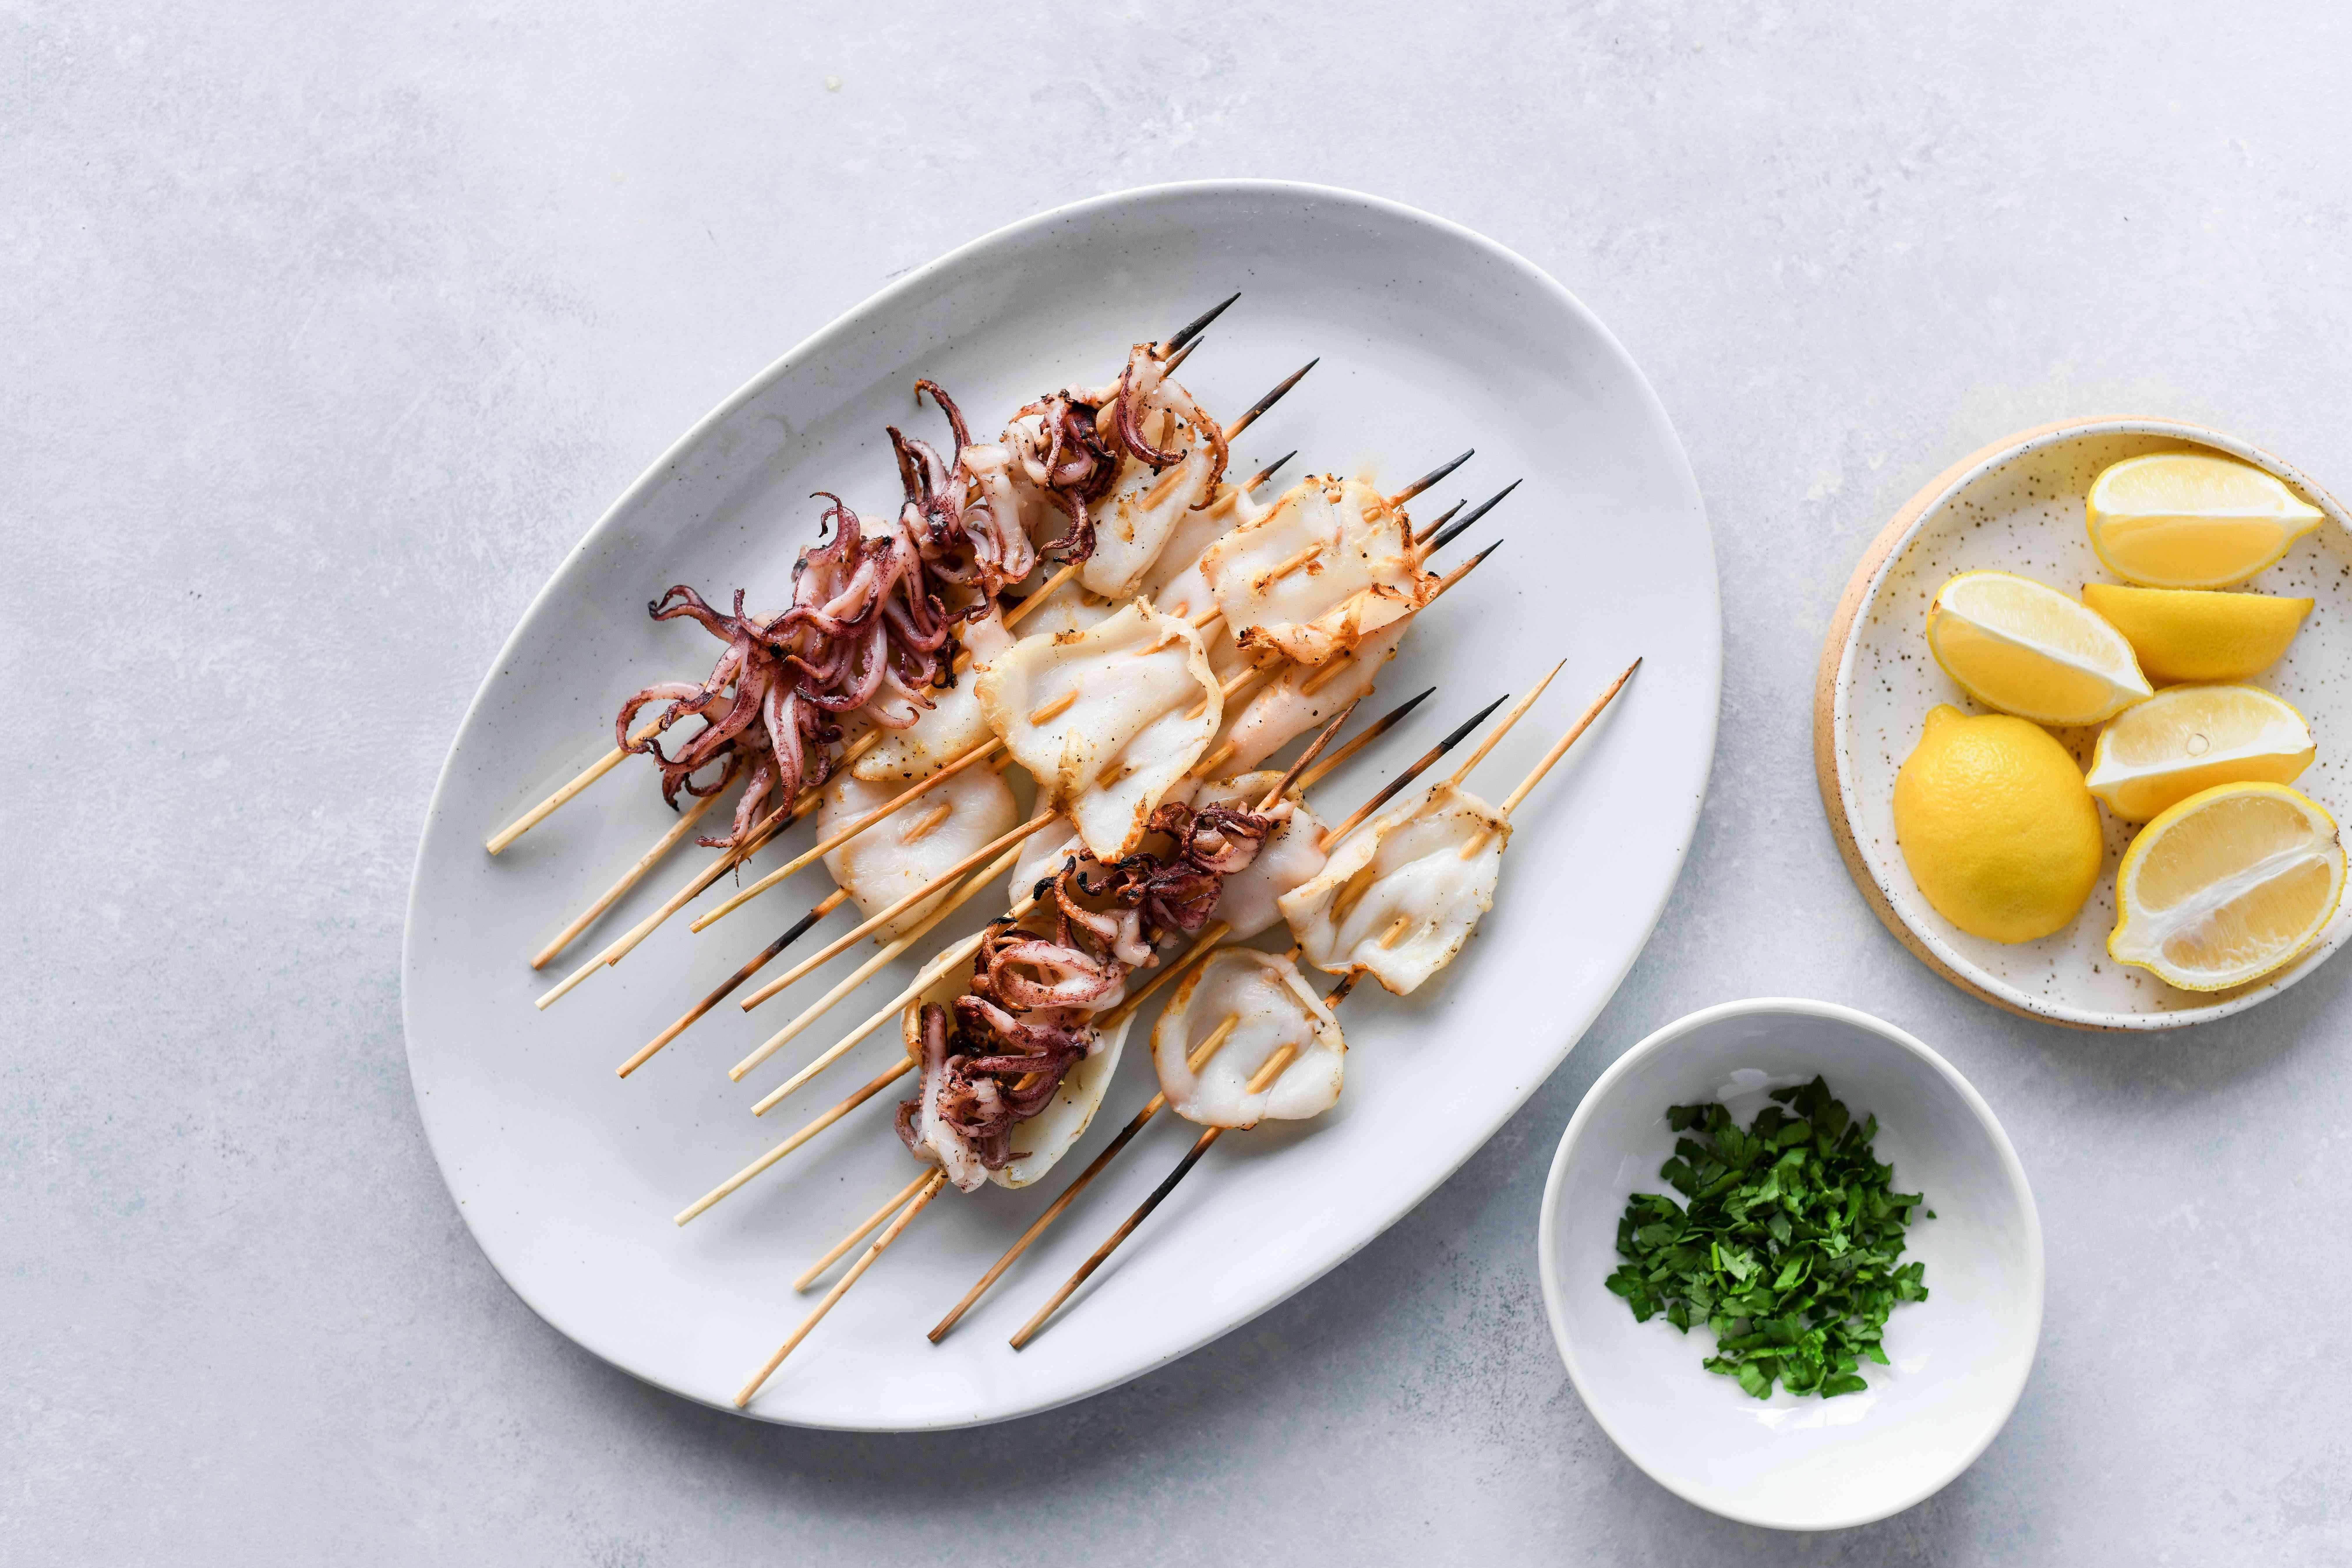 Grilled Squid (Calamari) on a plate, lemon wedges